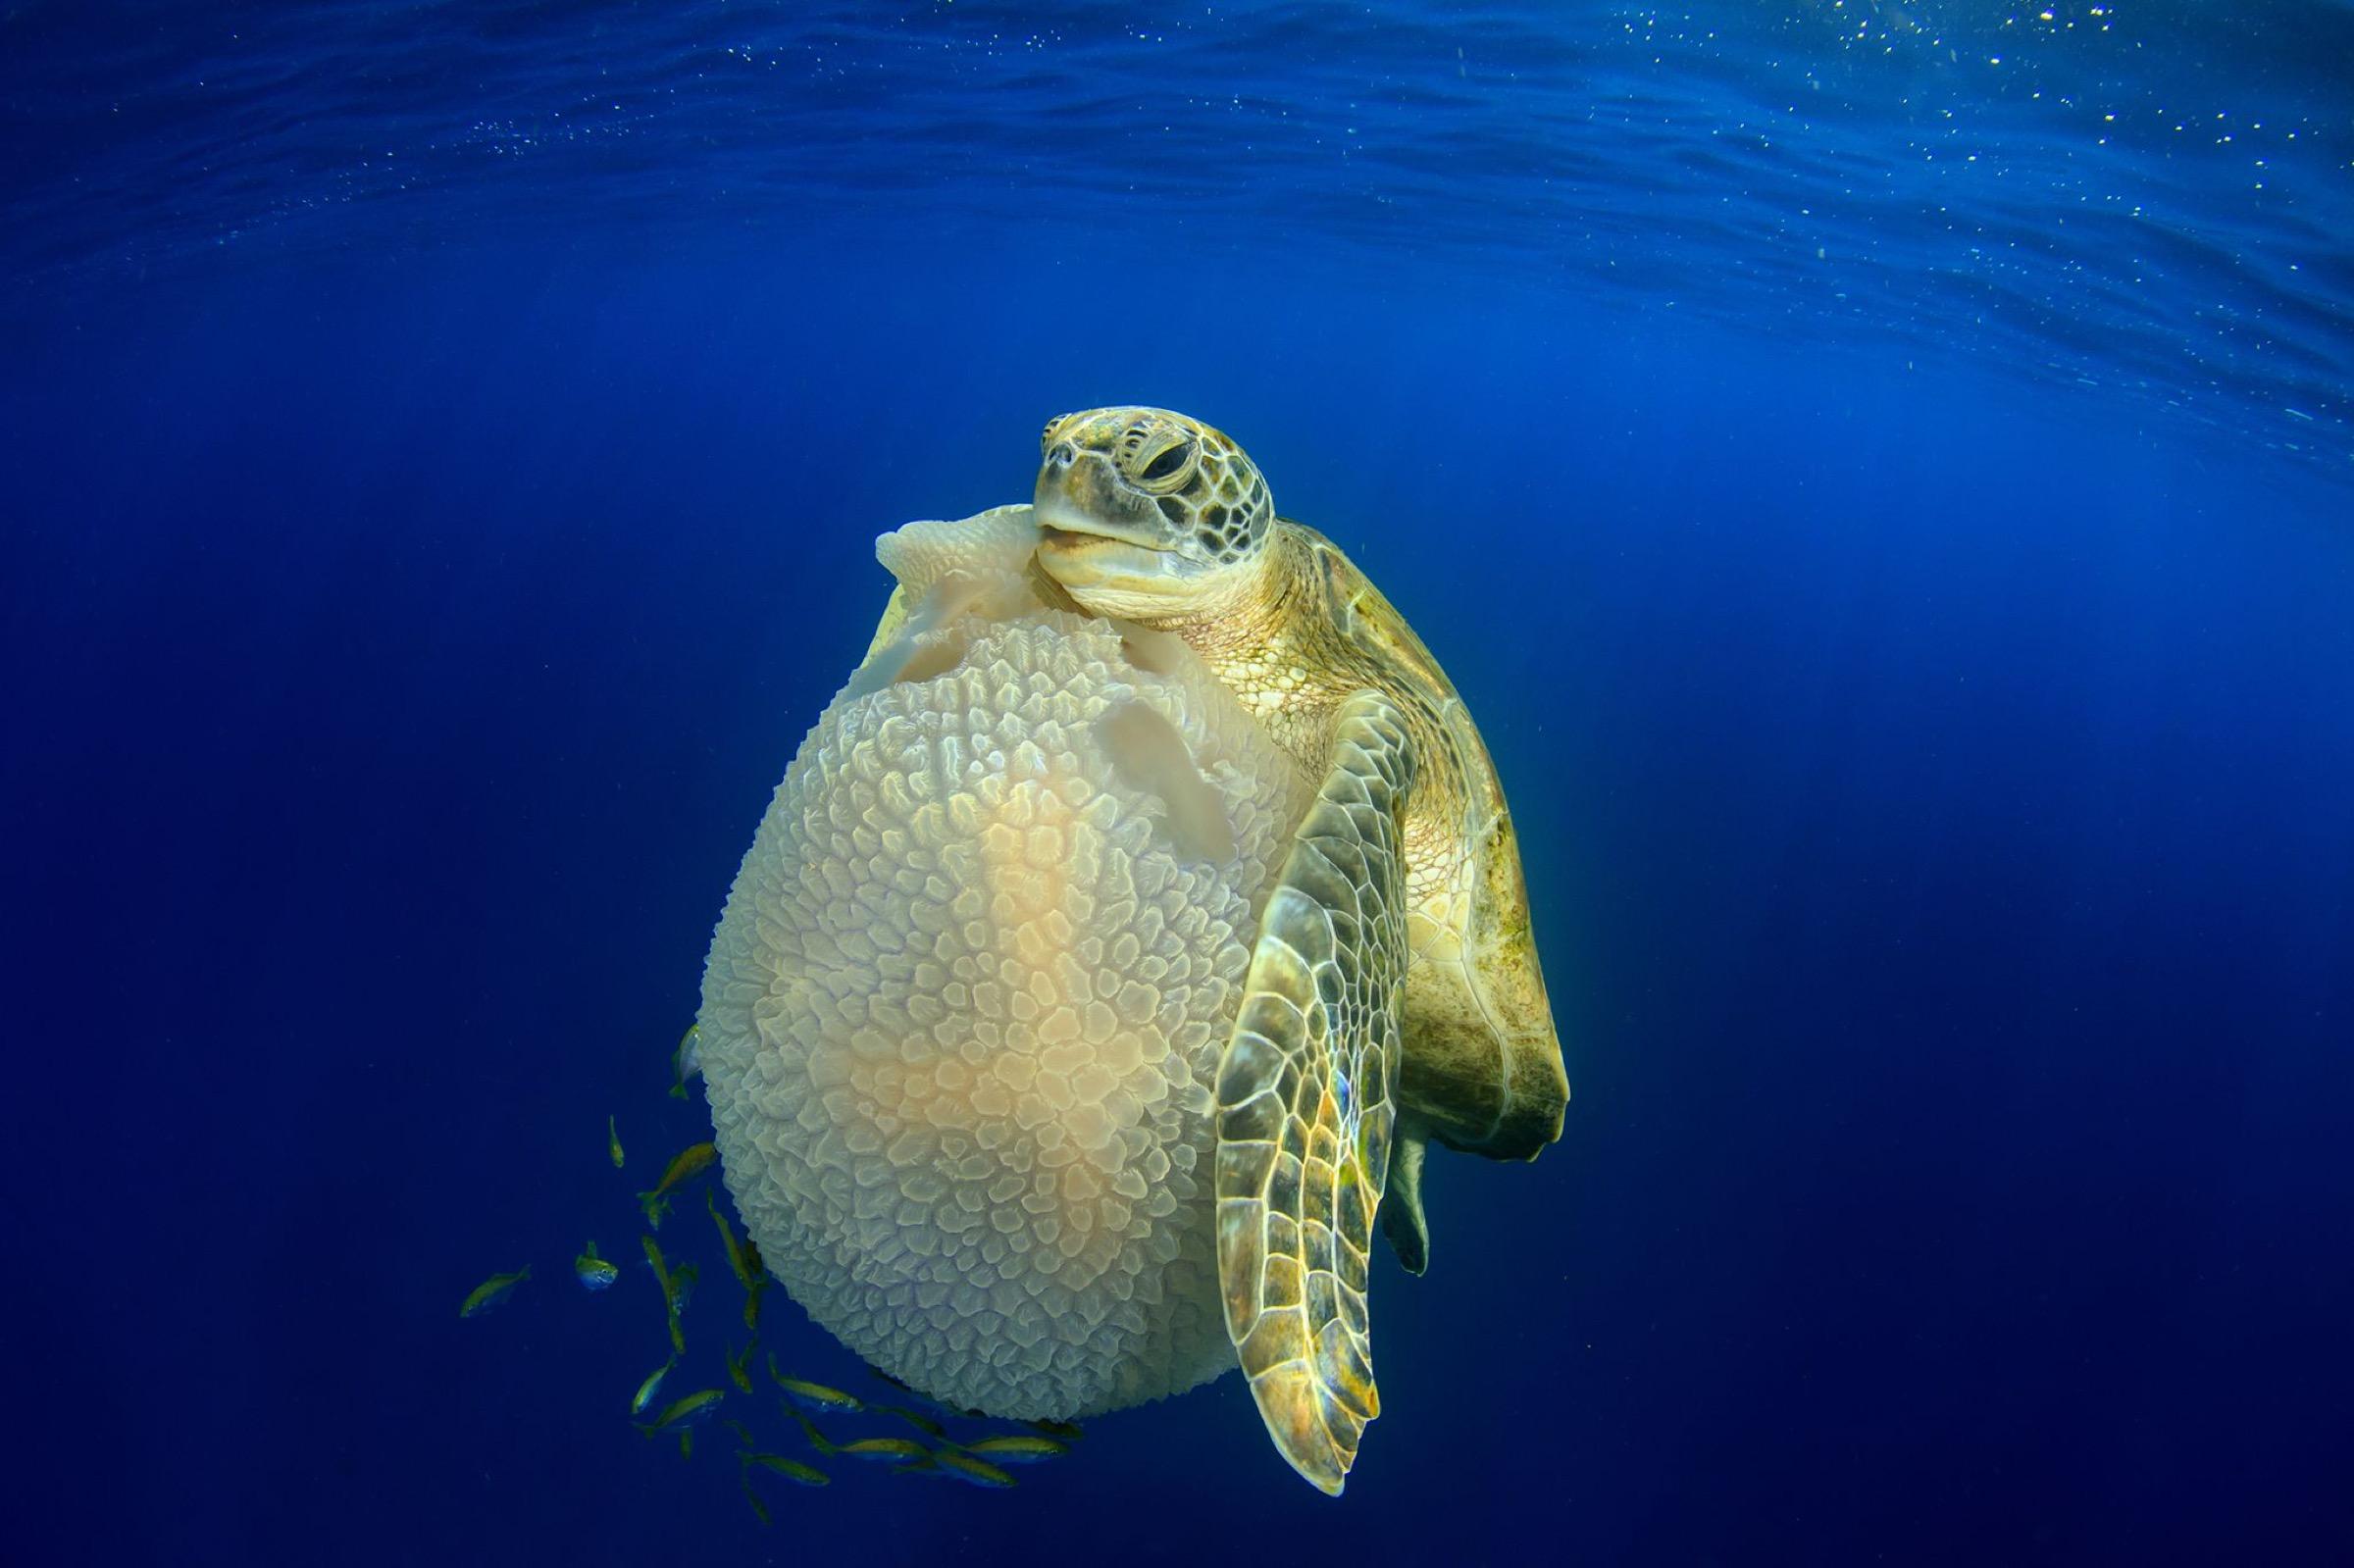 a young green sea turtle (Chelonia mydas)